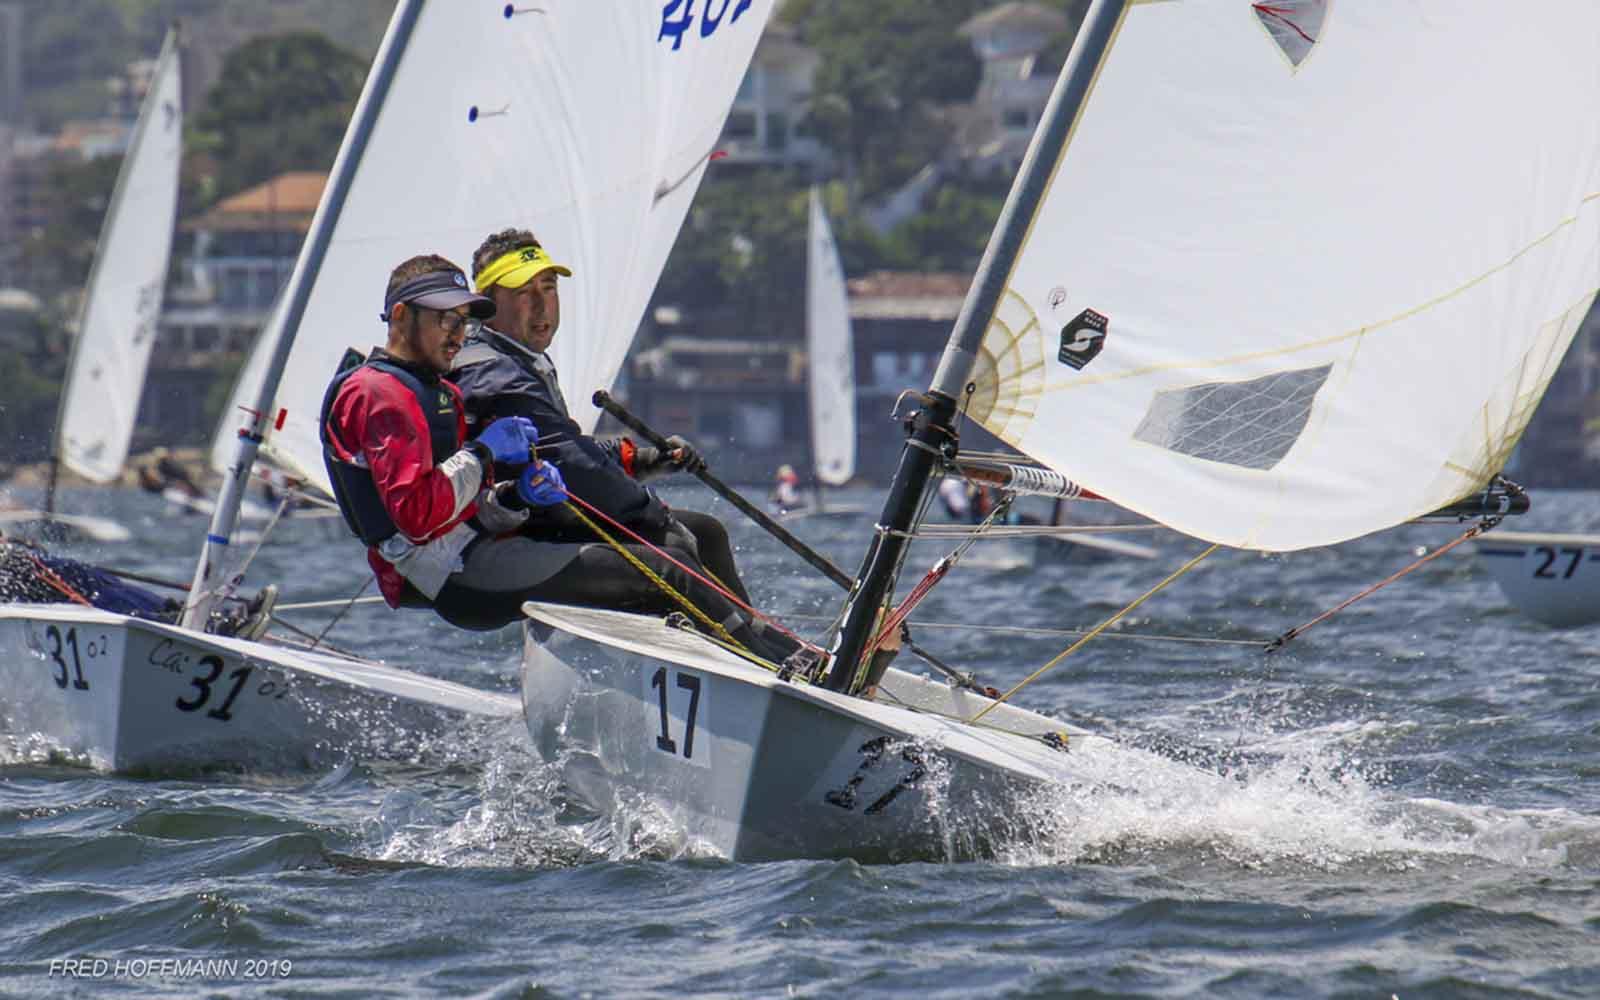 Luiz José Junior e Anísio Corrêa - terceiros colocados - FOTO FRED HOFFMAN - boat shopping